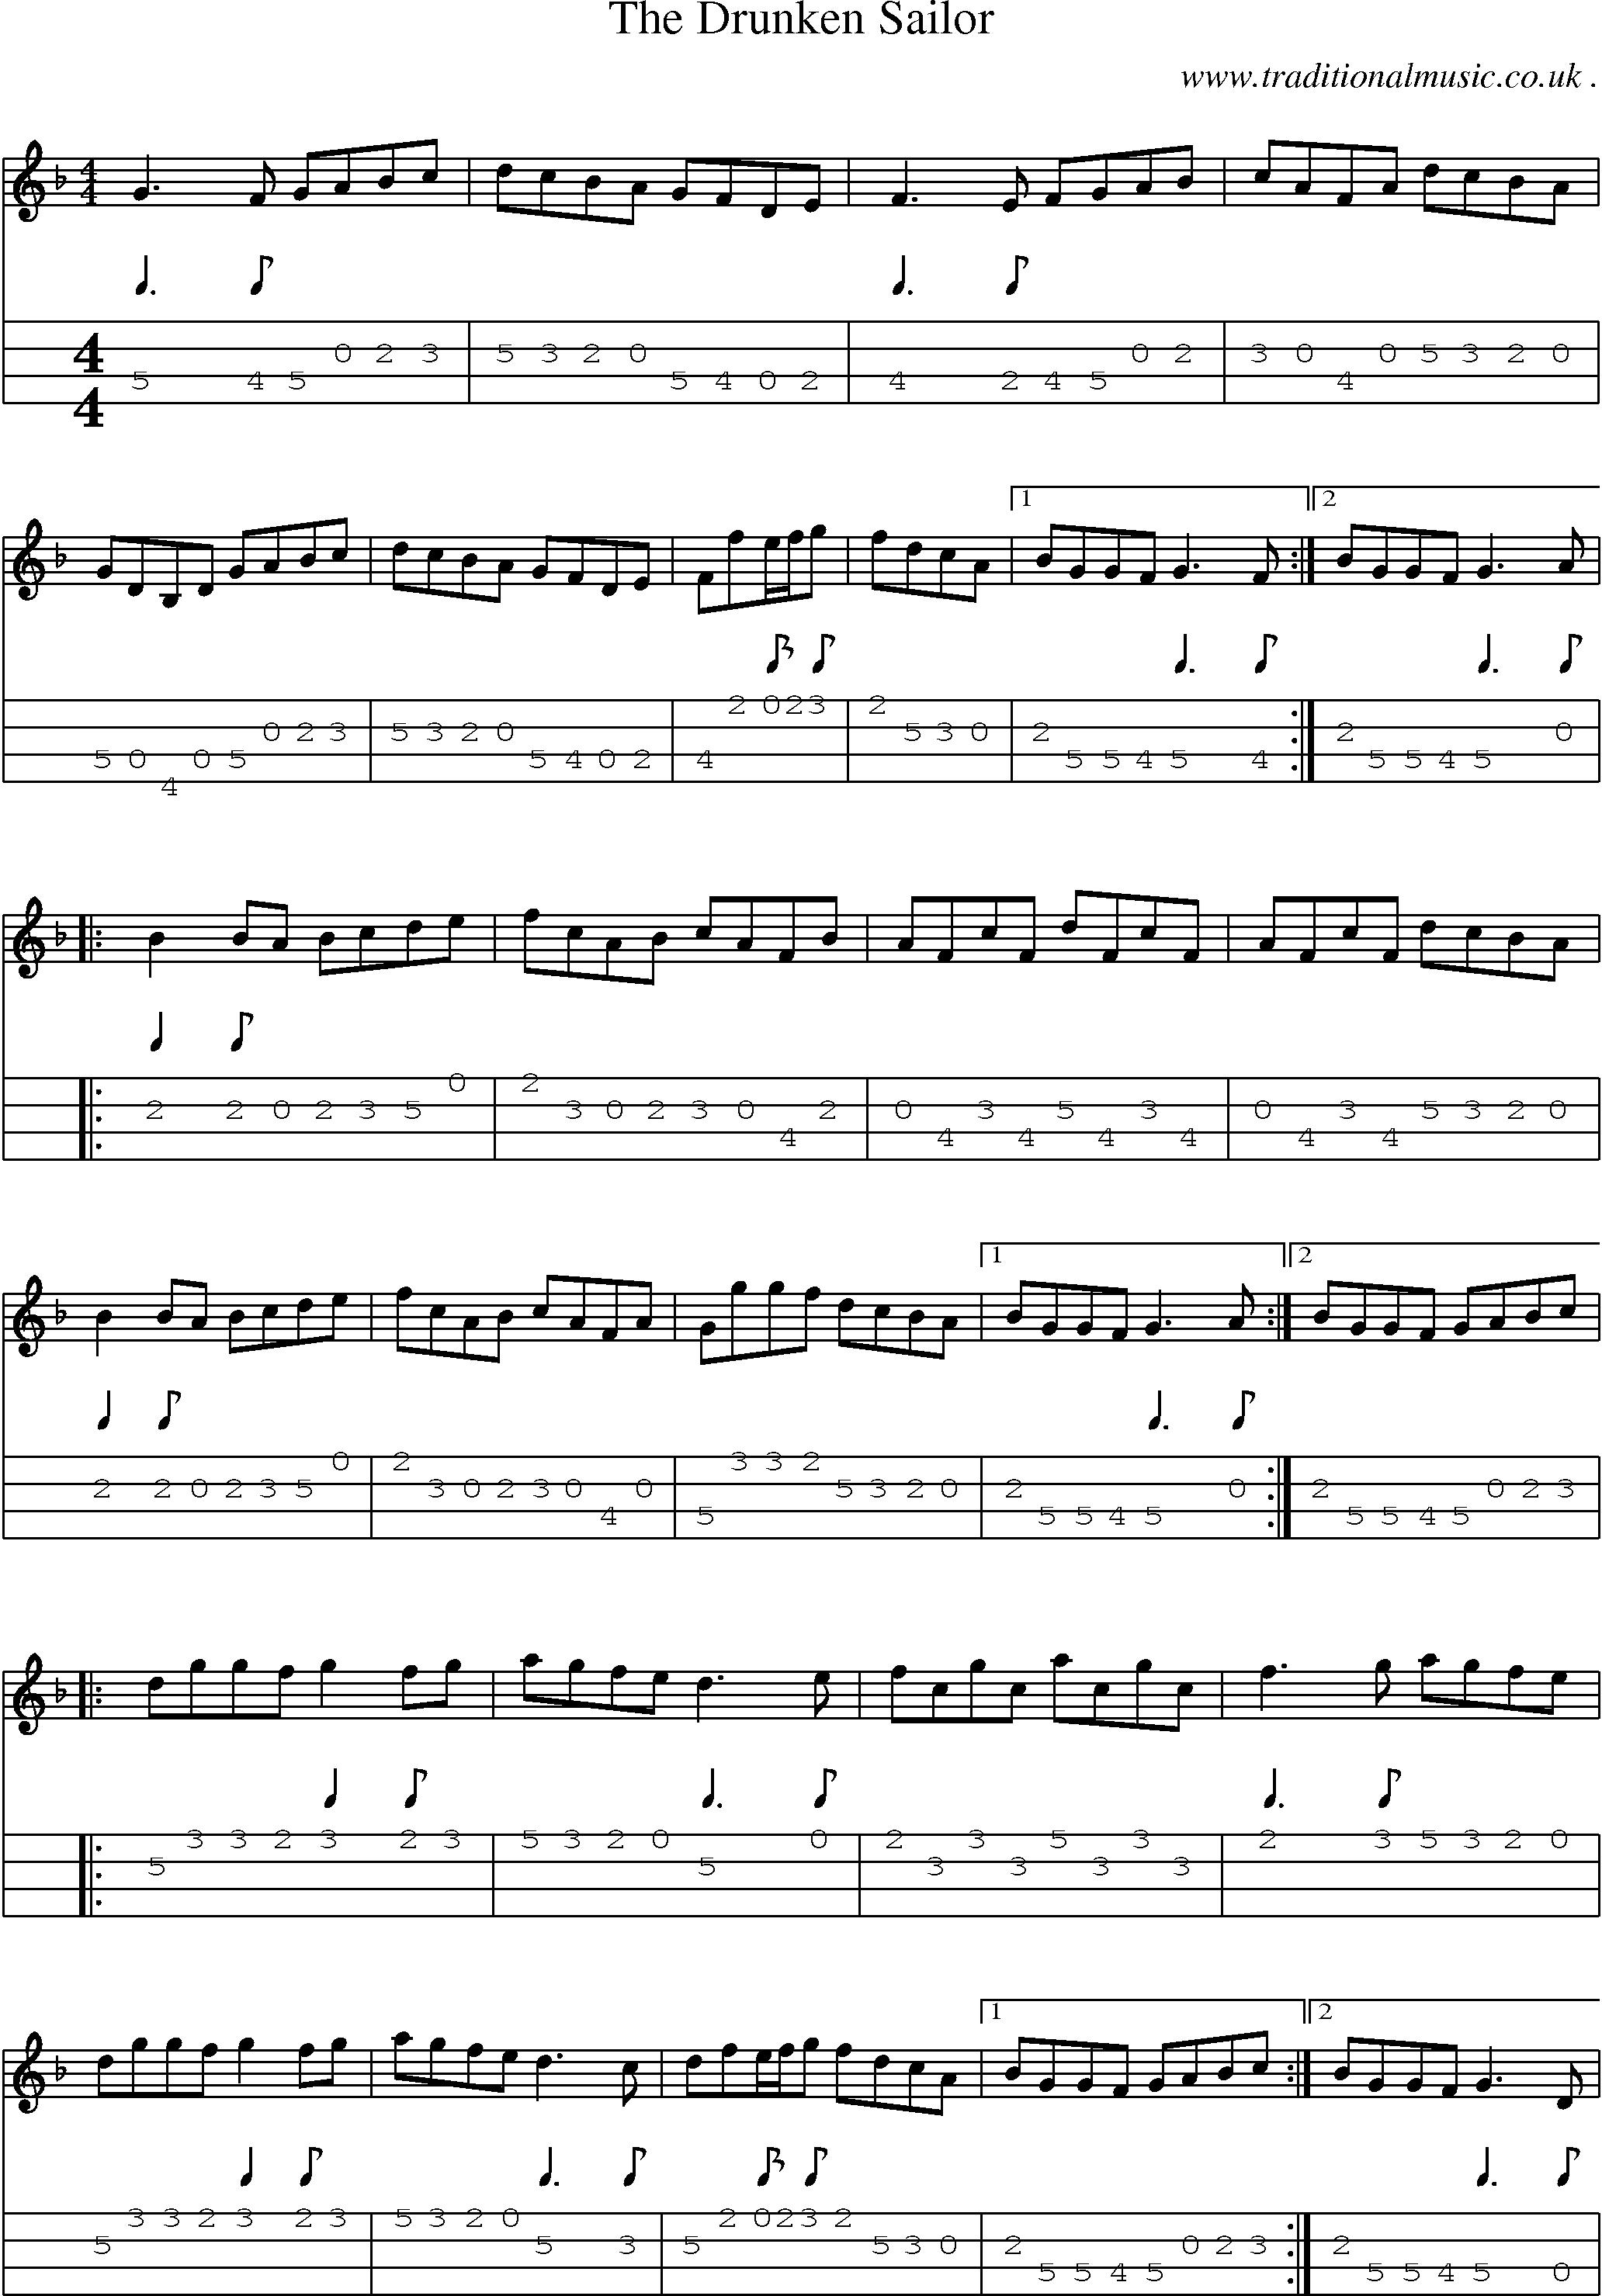 Sheet music and mandolin tabs for the drunken sailor mandolin sheet music and mandolin tabs for the drunken sailor hexwebz Images